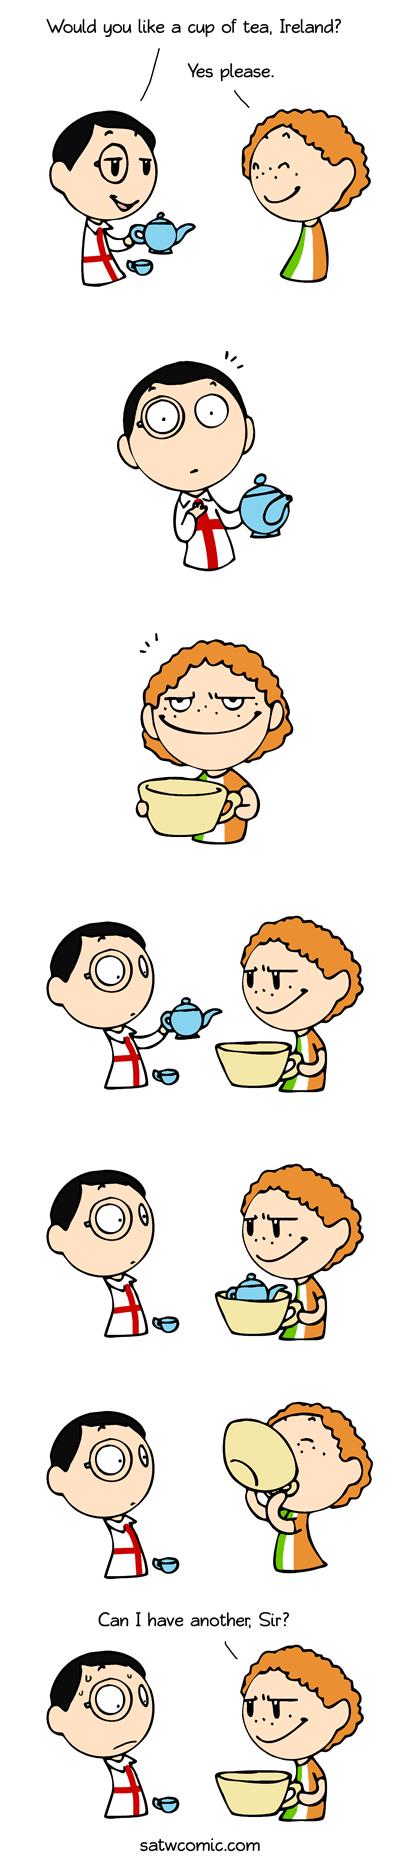 Cuppa satwcomic.com